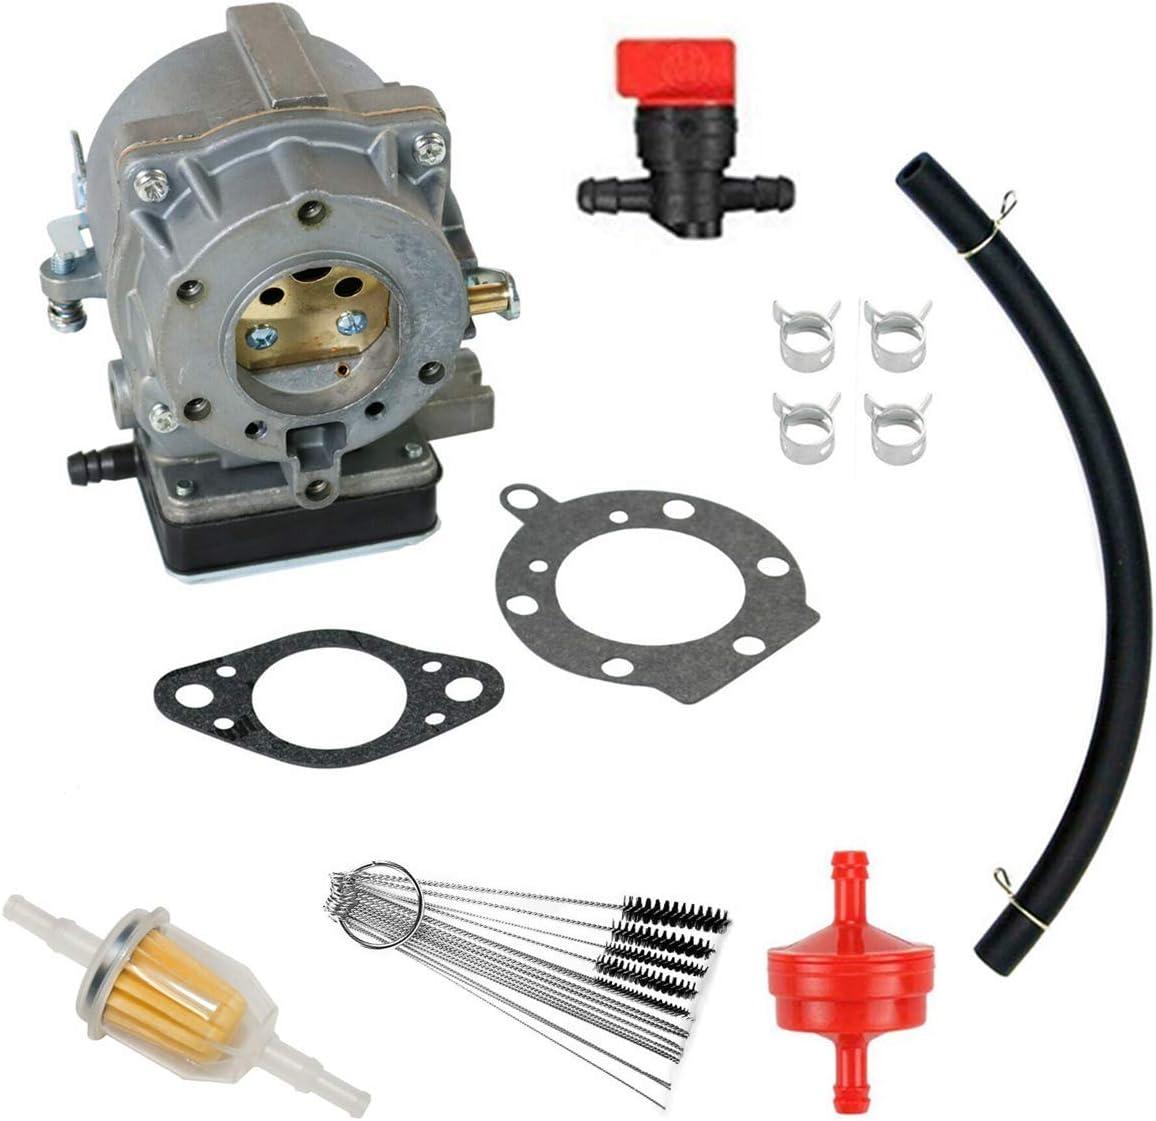 Aniro Moto Carburetor Replaces 16-21 Hp Briggs Stratton V-Twin Engine Murray Craftsman 692815